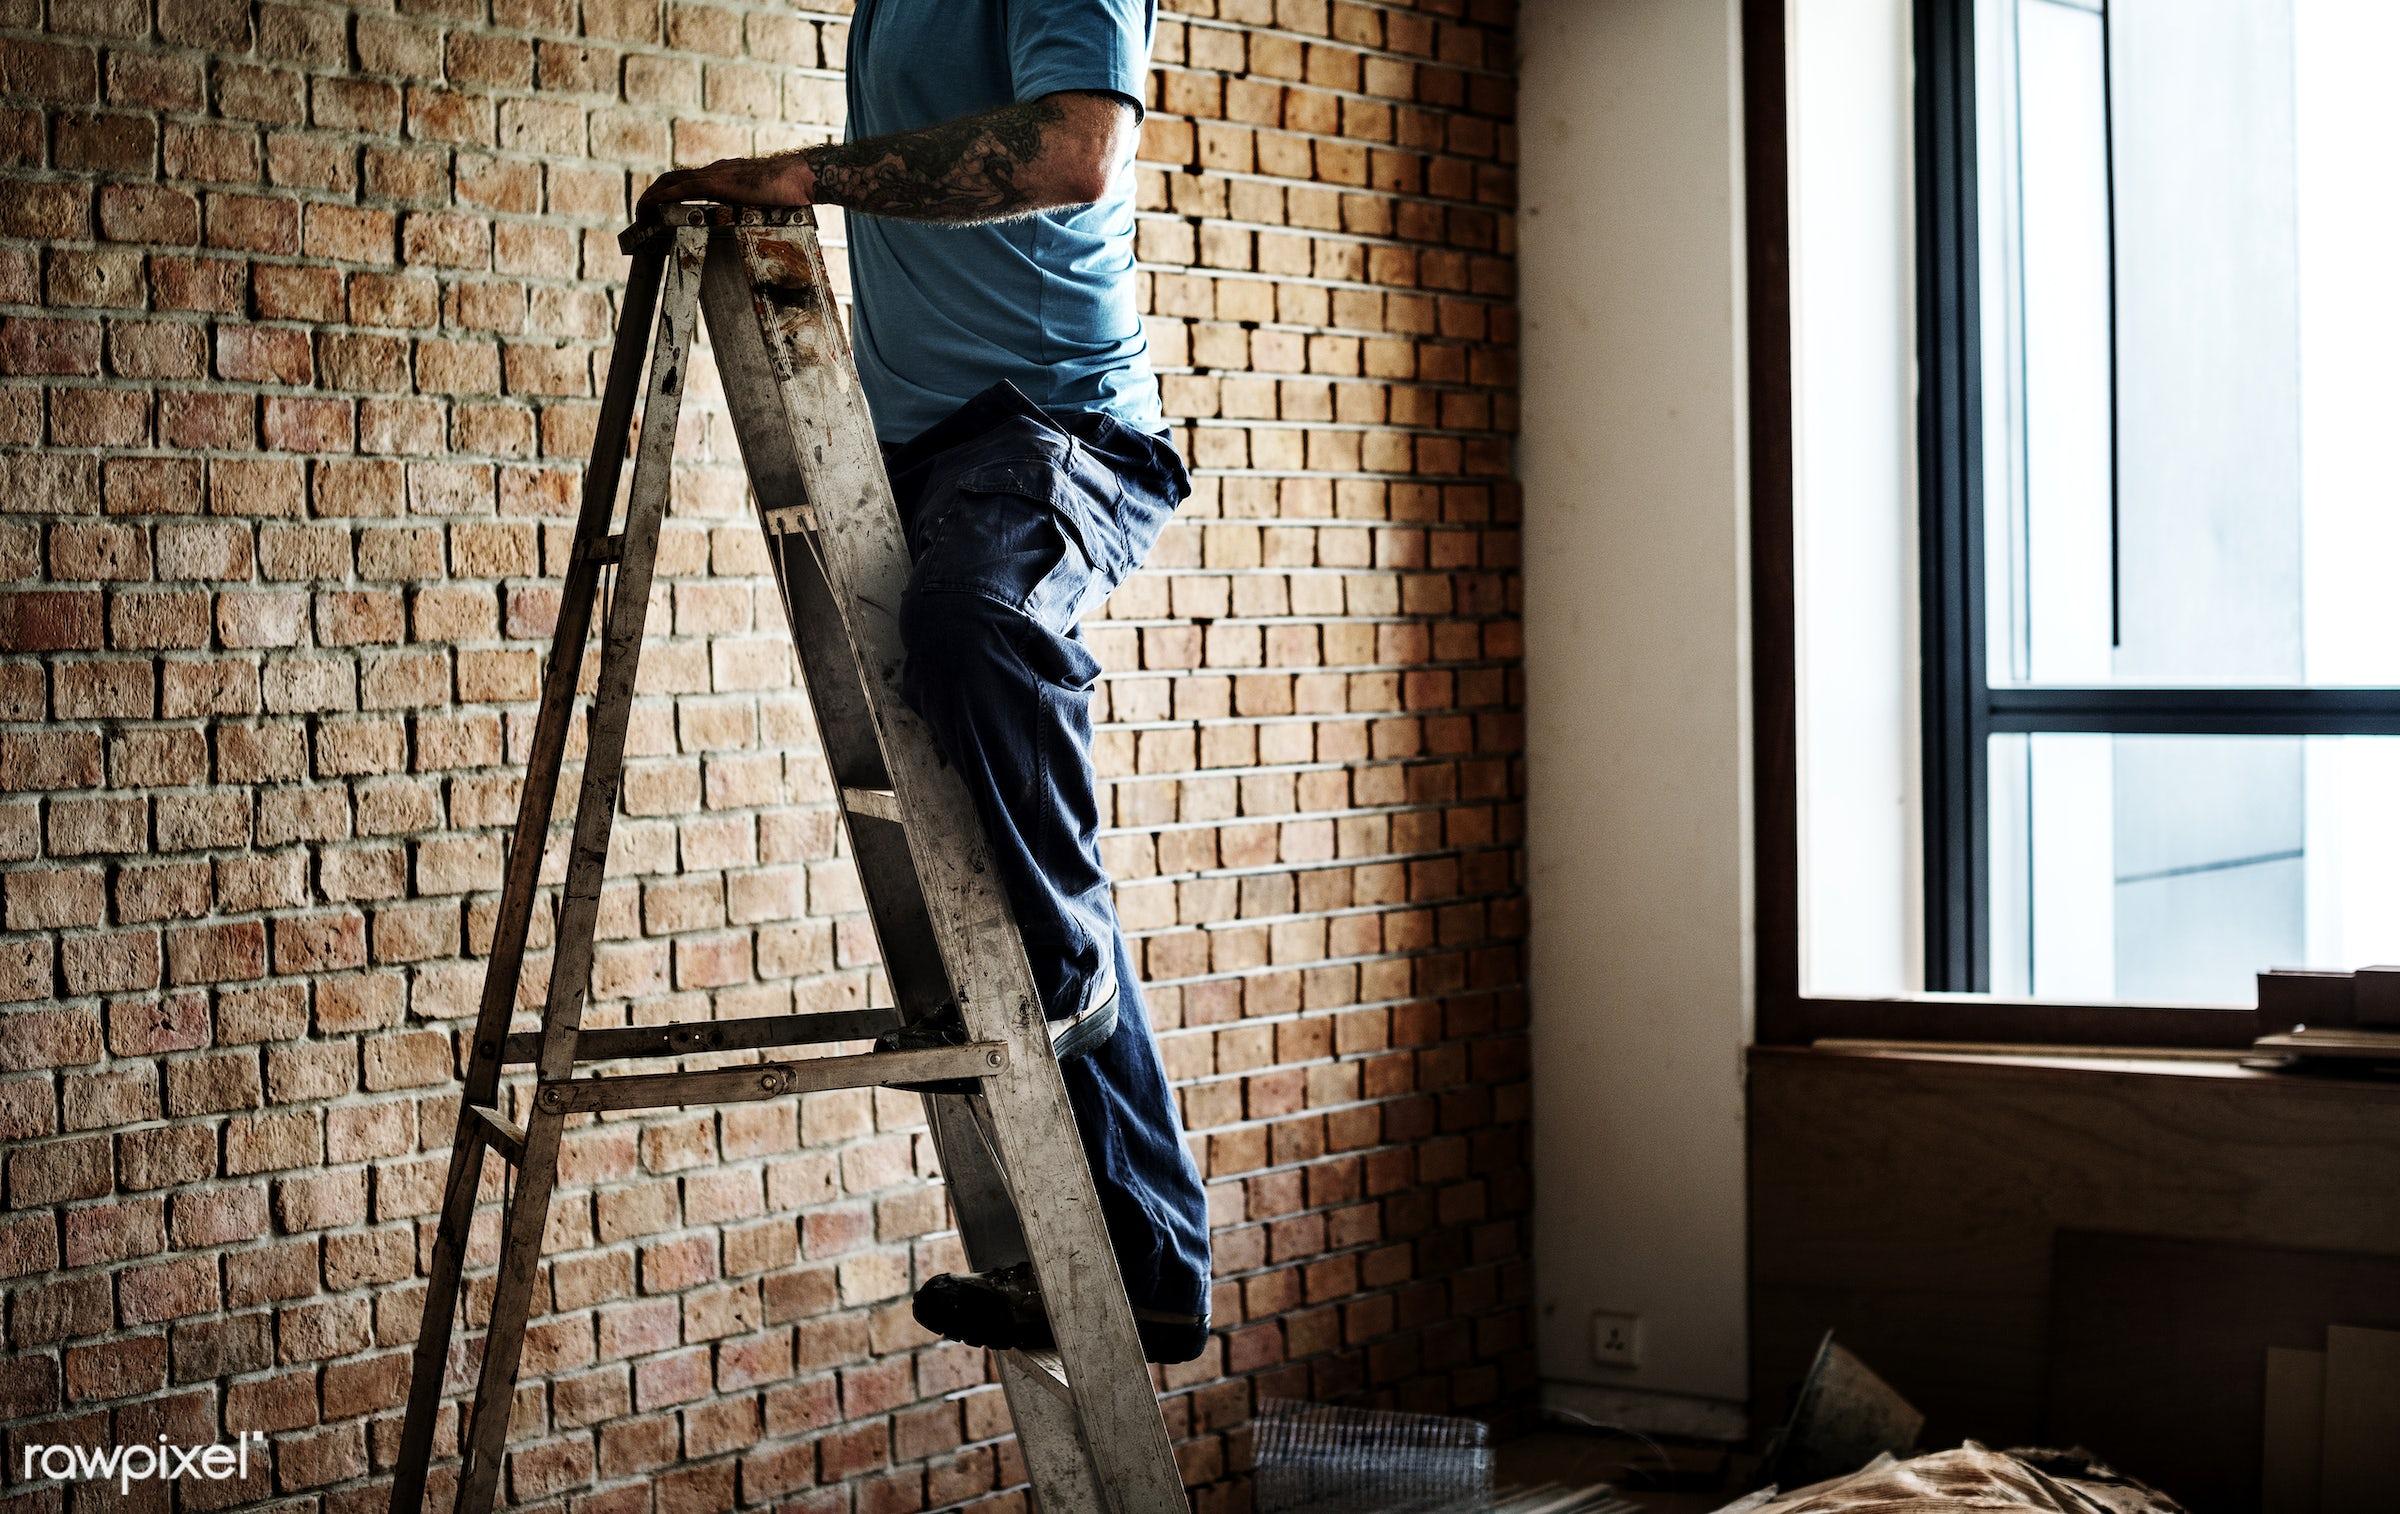 brick, equipment, build, tools, materials, handyman, craftsman, worker, repair, workman, working, tattoo, man, ladder,...